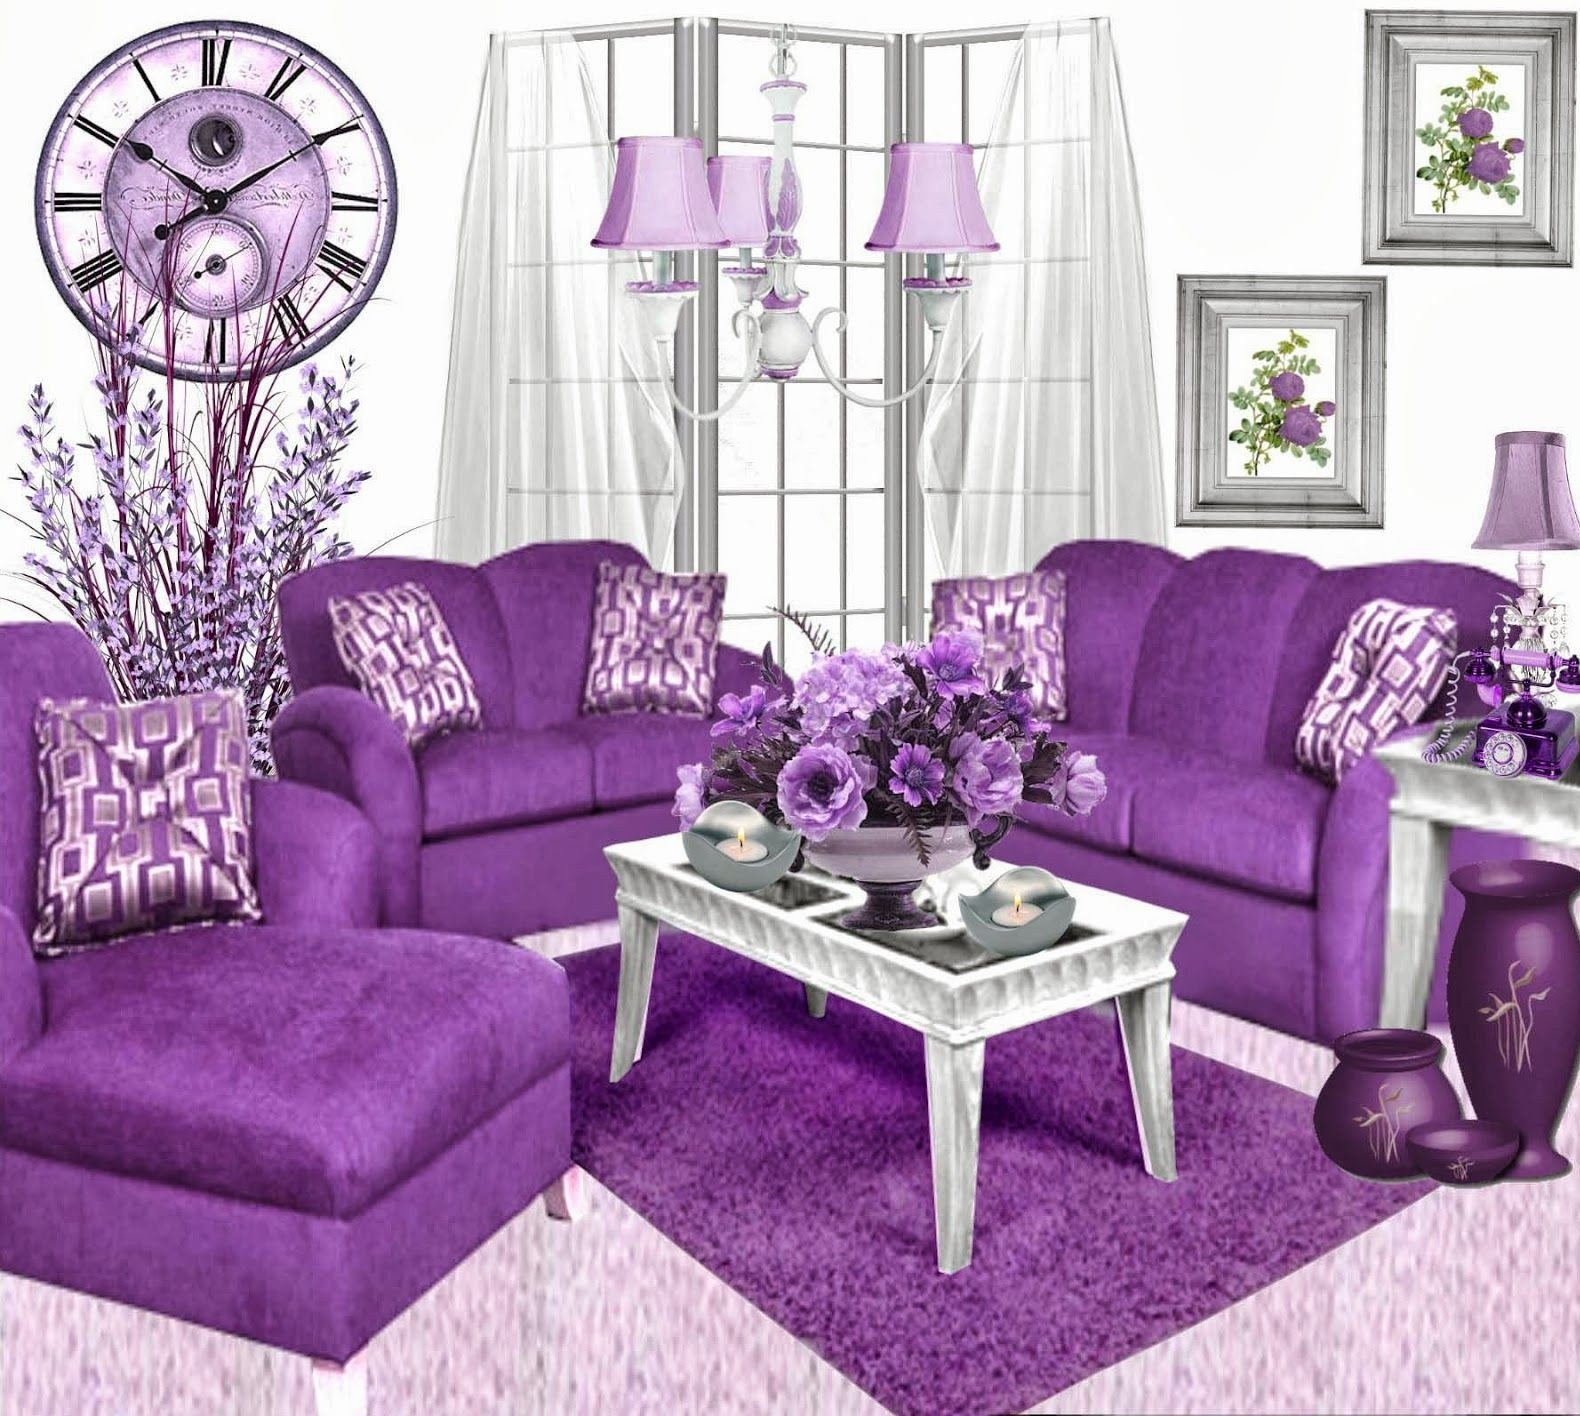 Purple Decor for Living Room Best Of Tips On Decorating Purple Living Room Decorating Room